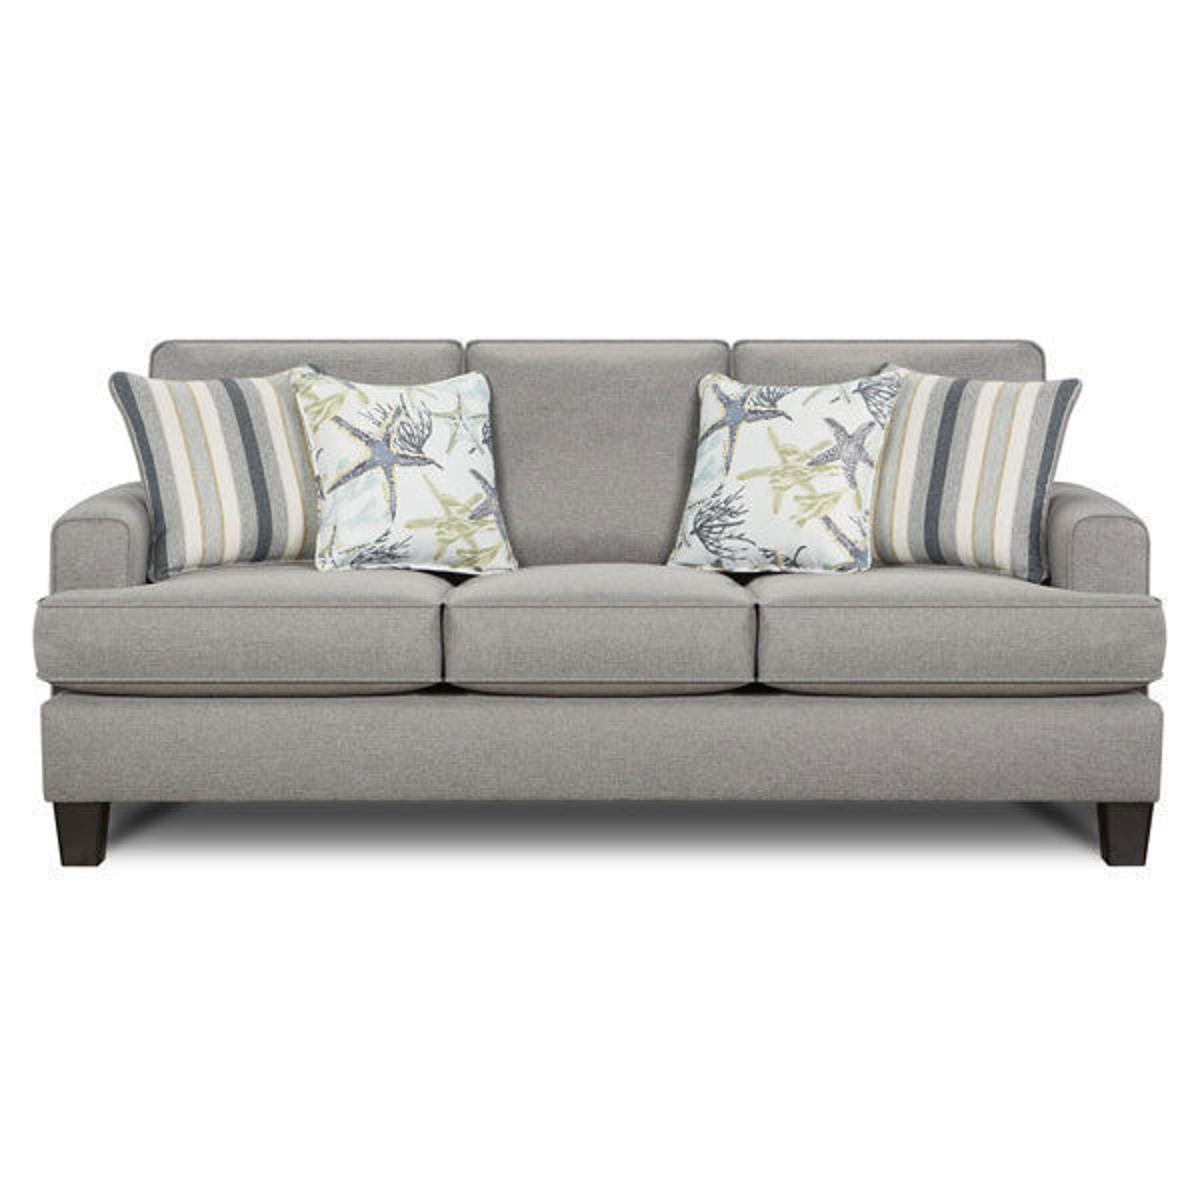 Picture of Preston Sleeper Sofa